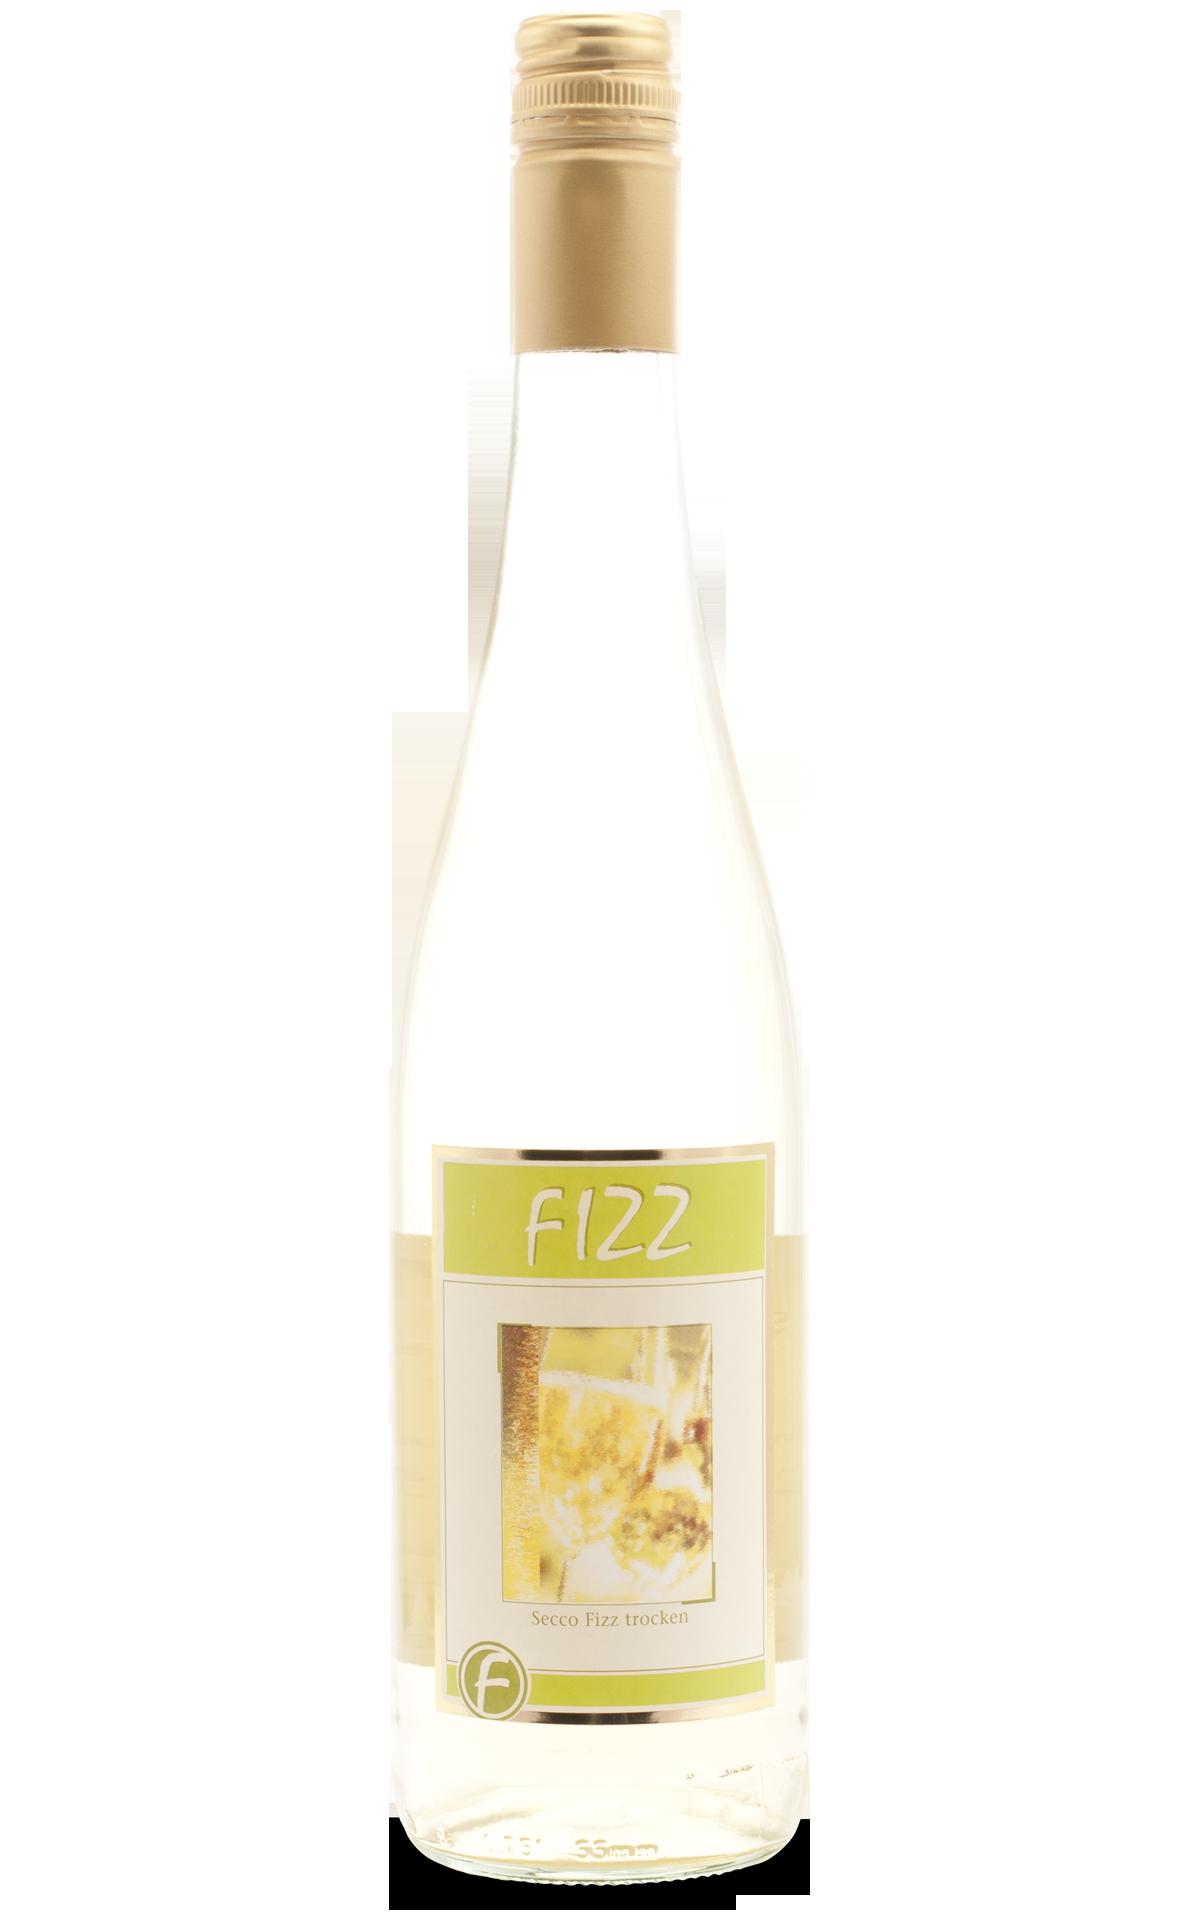 Secco FIZZ - Die prickelnde Lust